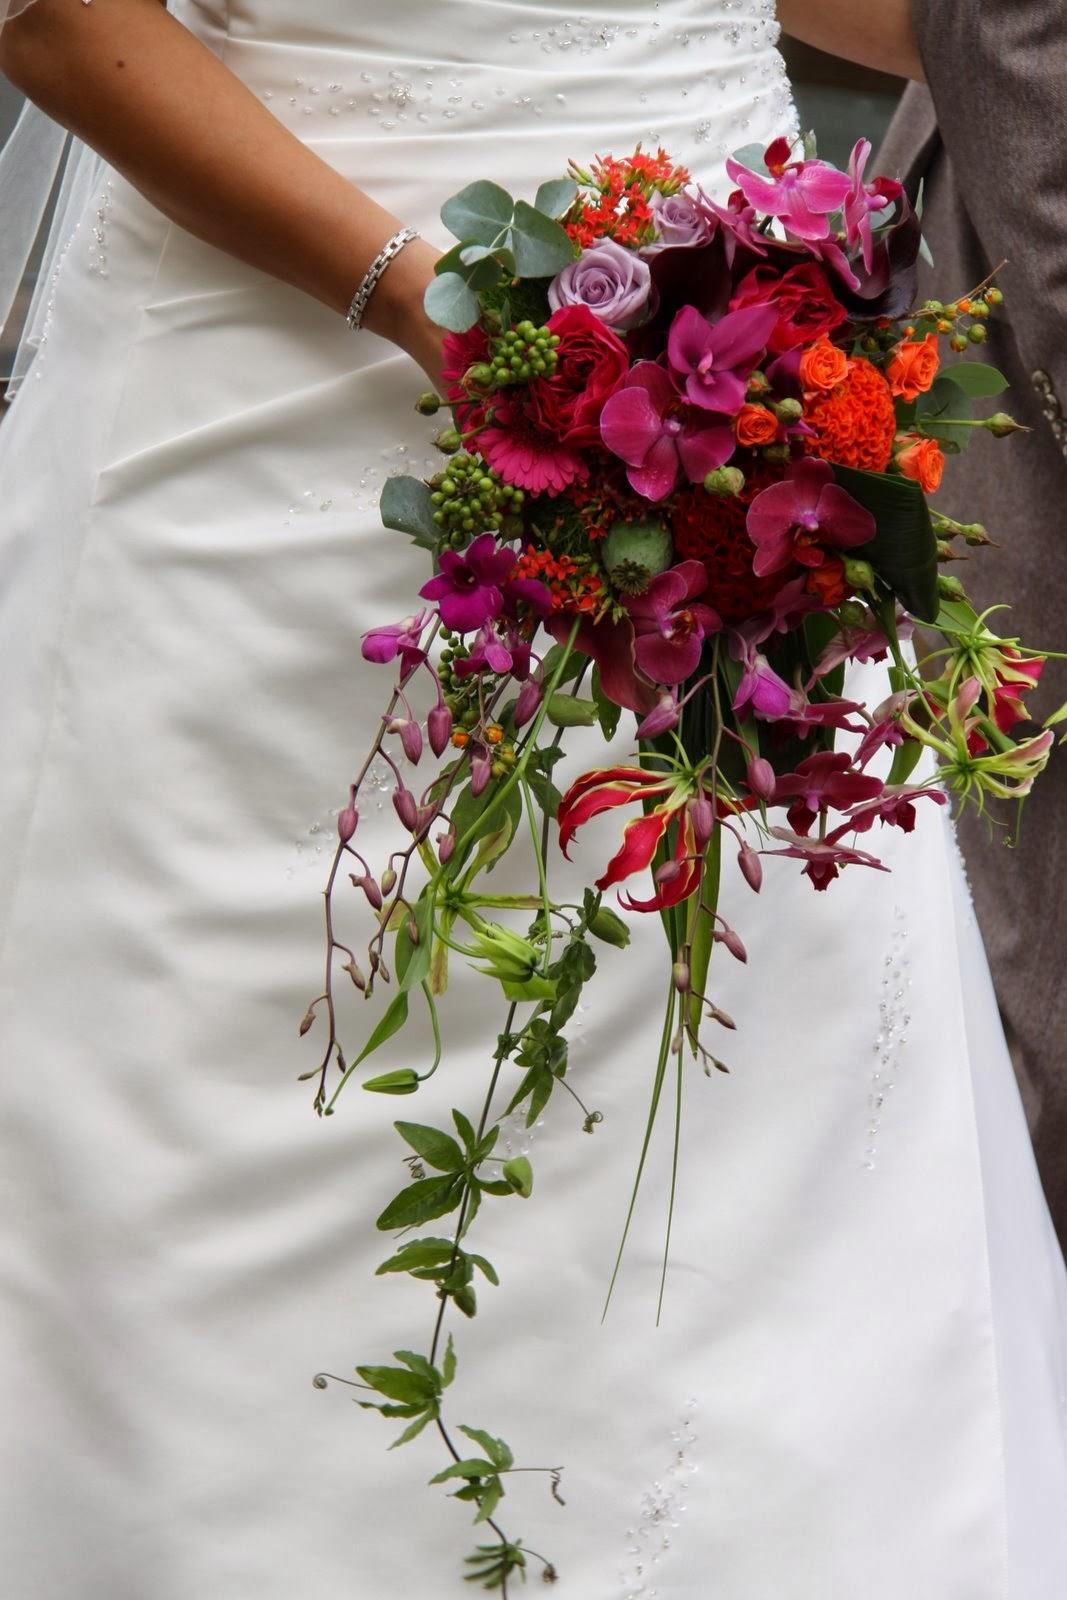 Wedding Cascade Bouquet Ideas : Memorable wedding types of bouquets